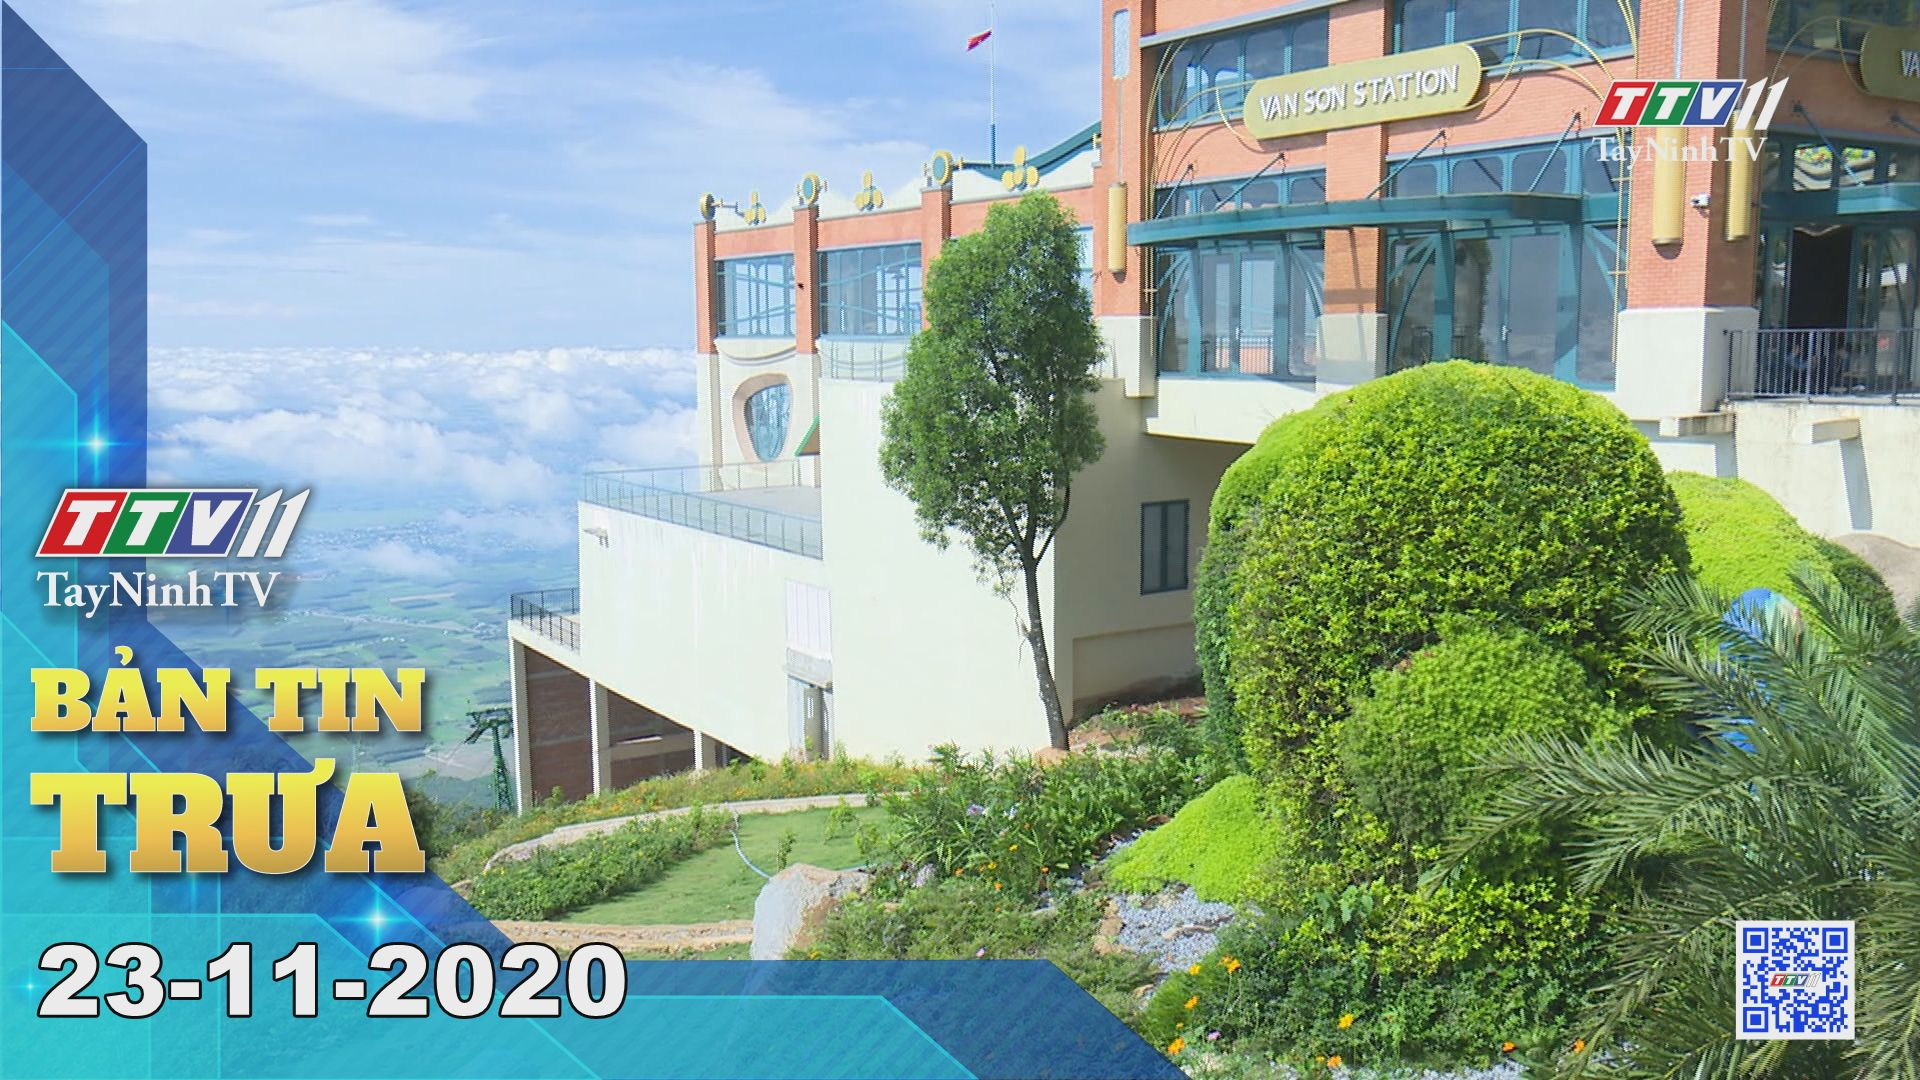 Bản tin trưa 23-11-2020 | Tin tức hôm nay | TayNinhTV